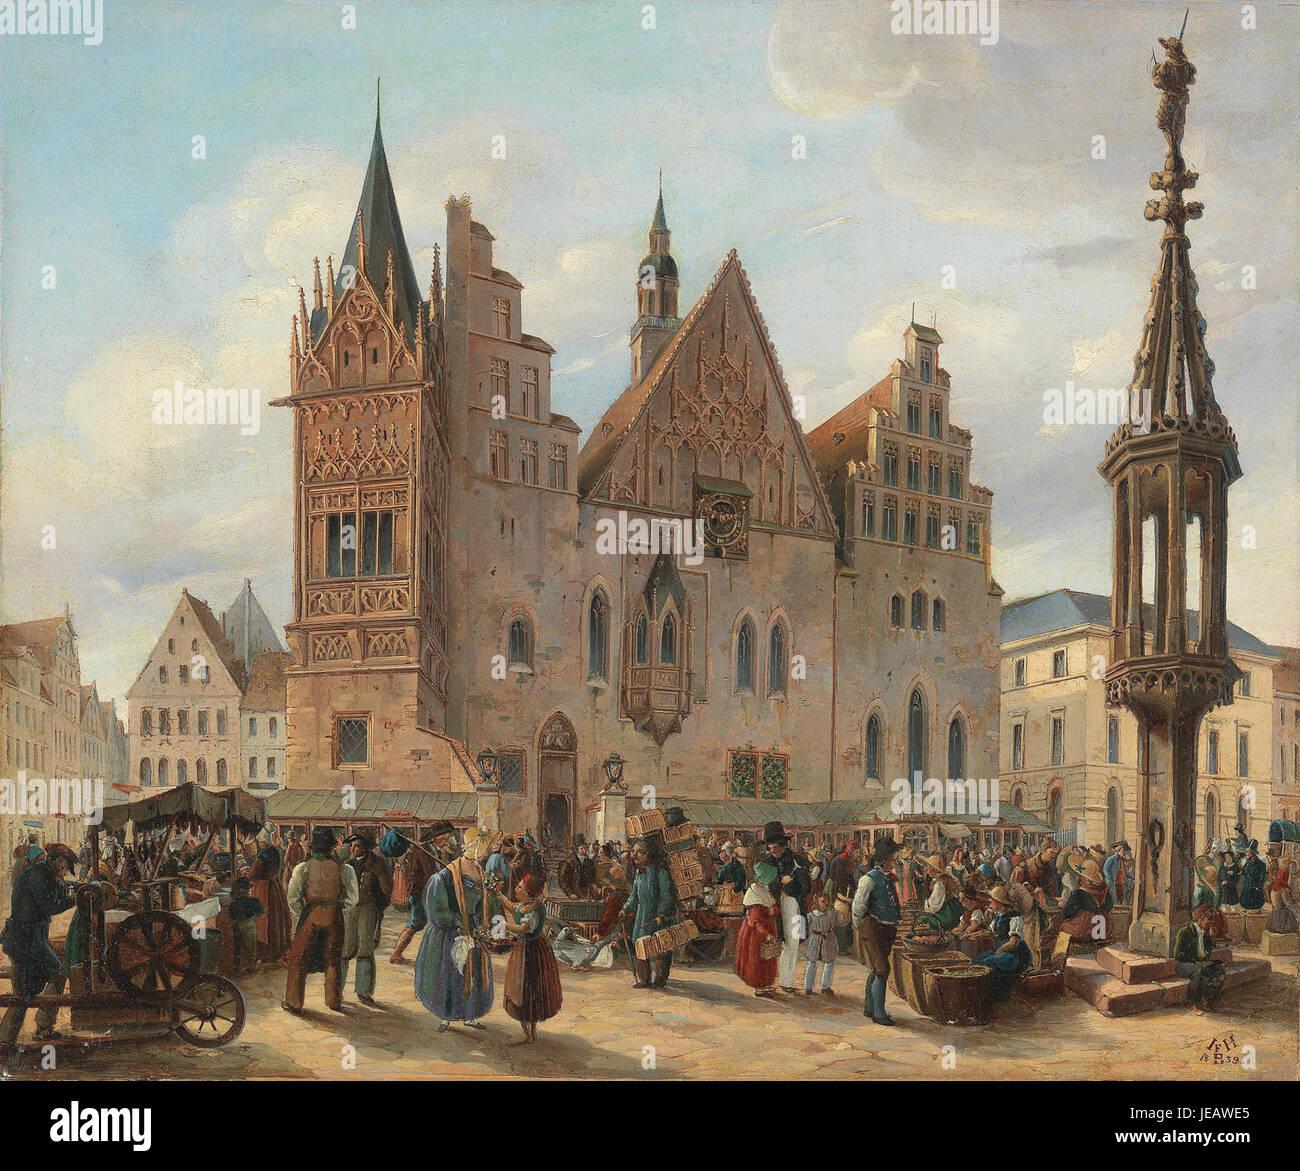 https://c7.alamy.com/comp/JEAWE5/bondras-marktplatz-von-breslau-1839-JEAWE5.jpg